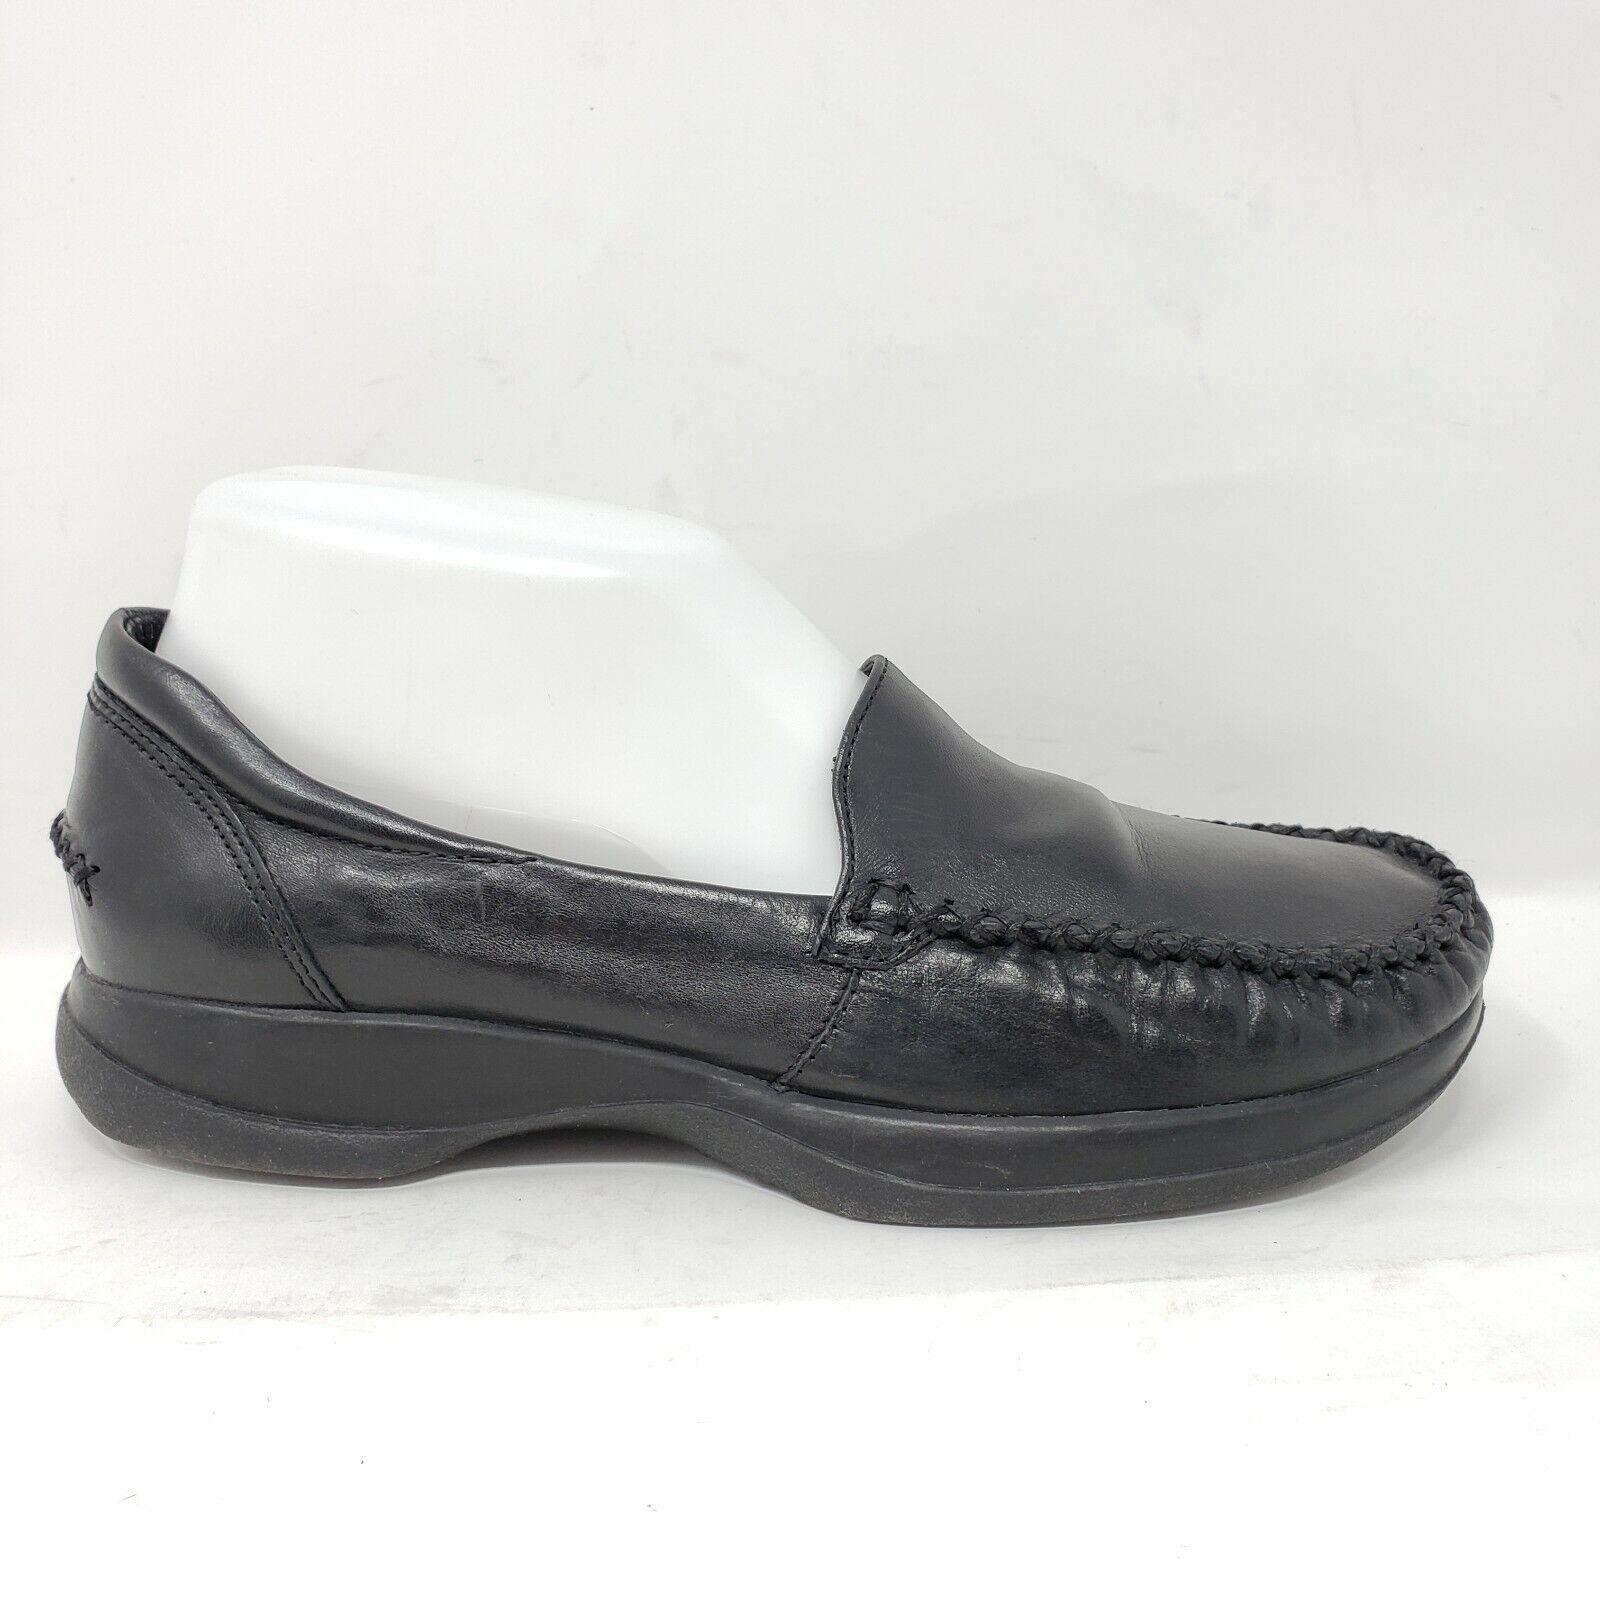 Thom McAn Women's Shoes Sz 6 Black Leather Moc Toe Loafers Slip On EUC